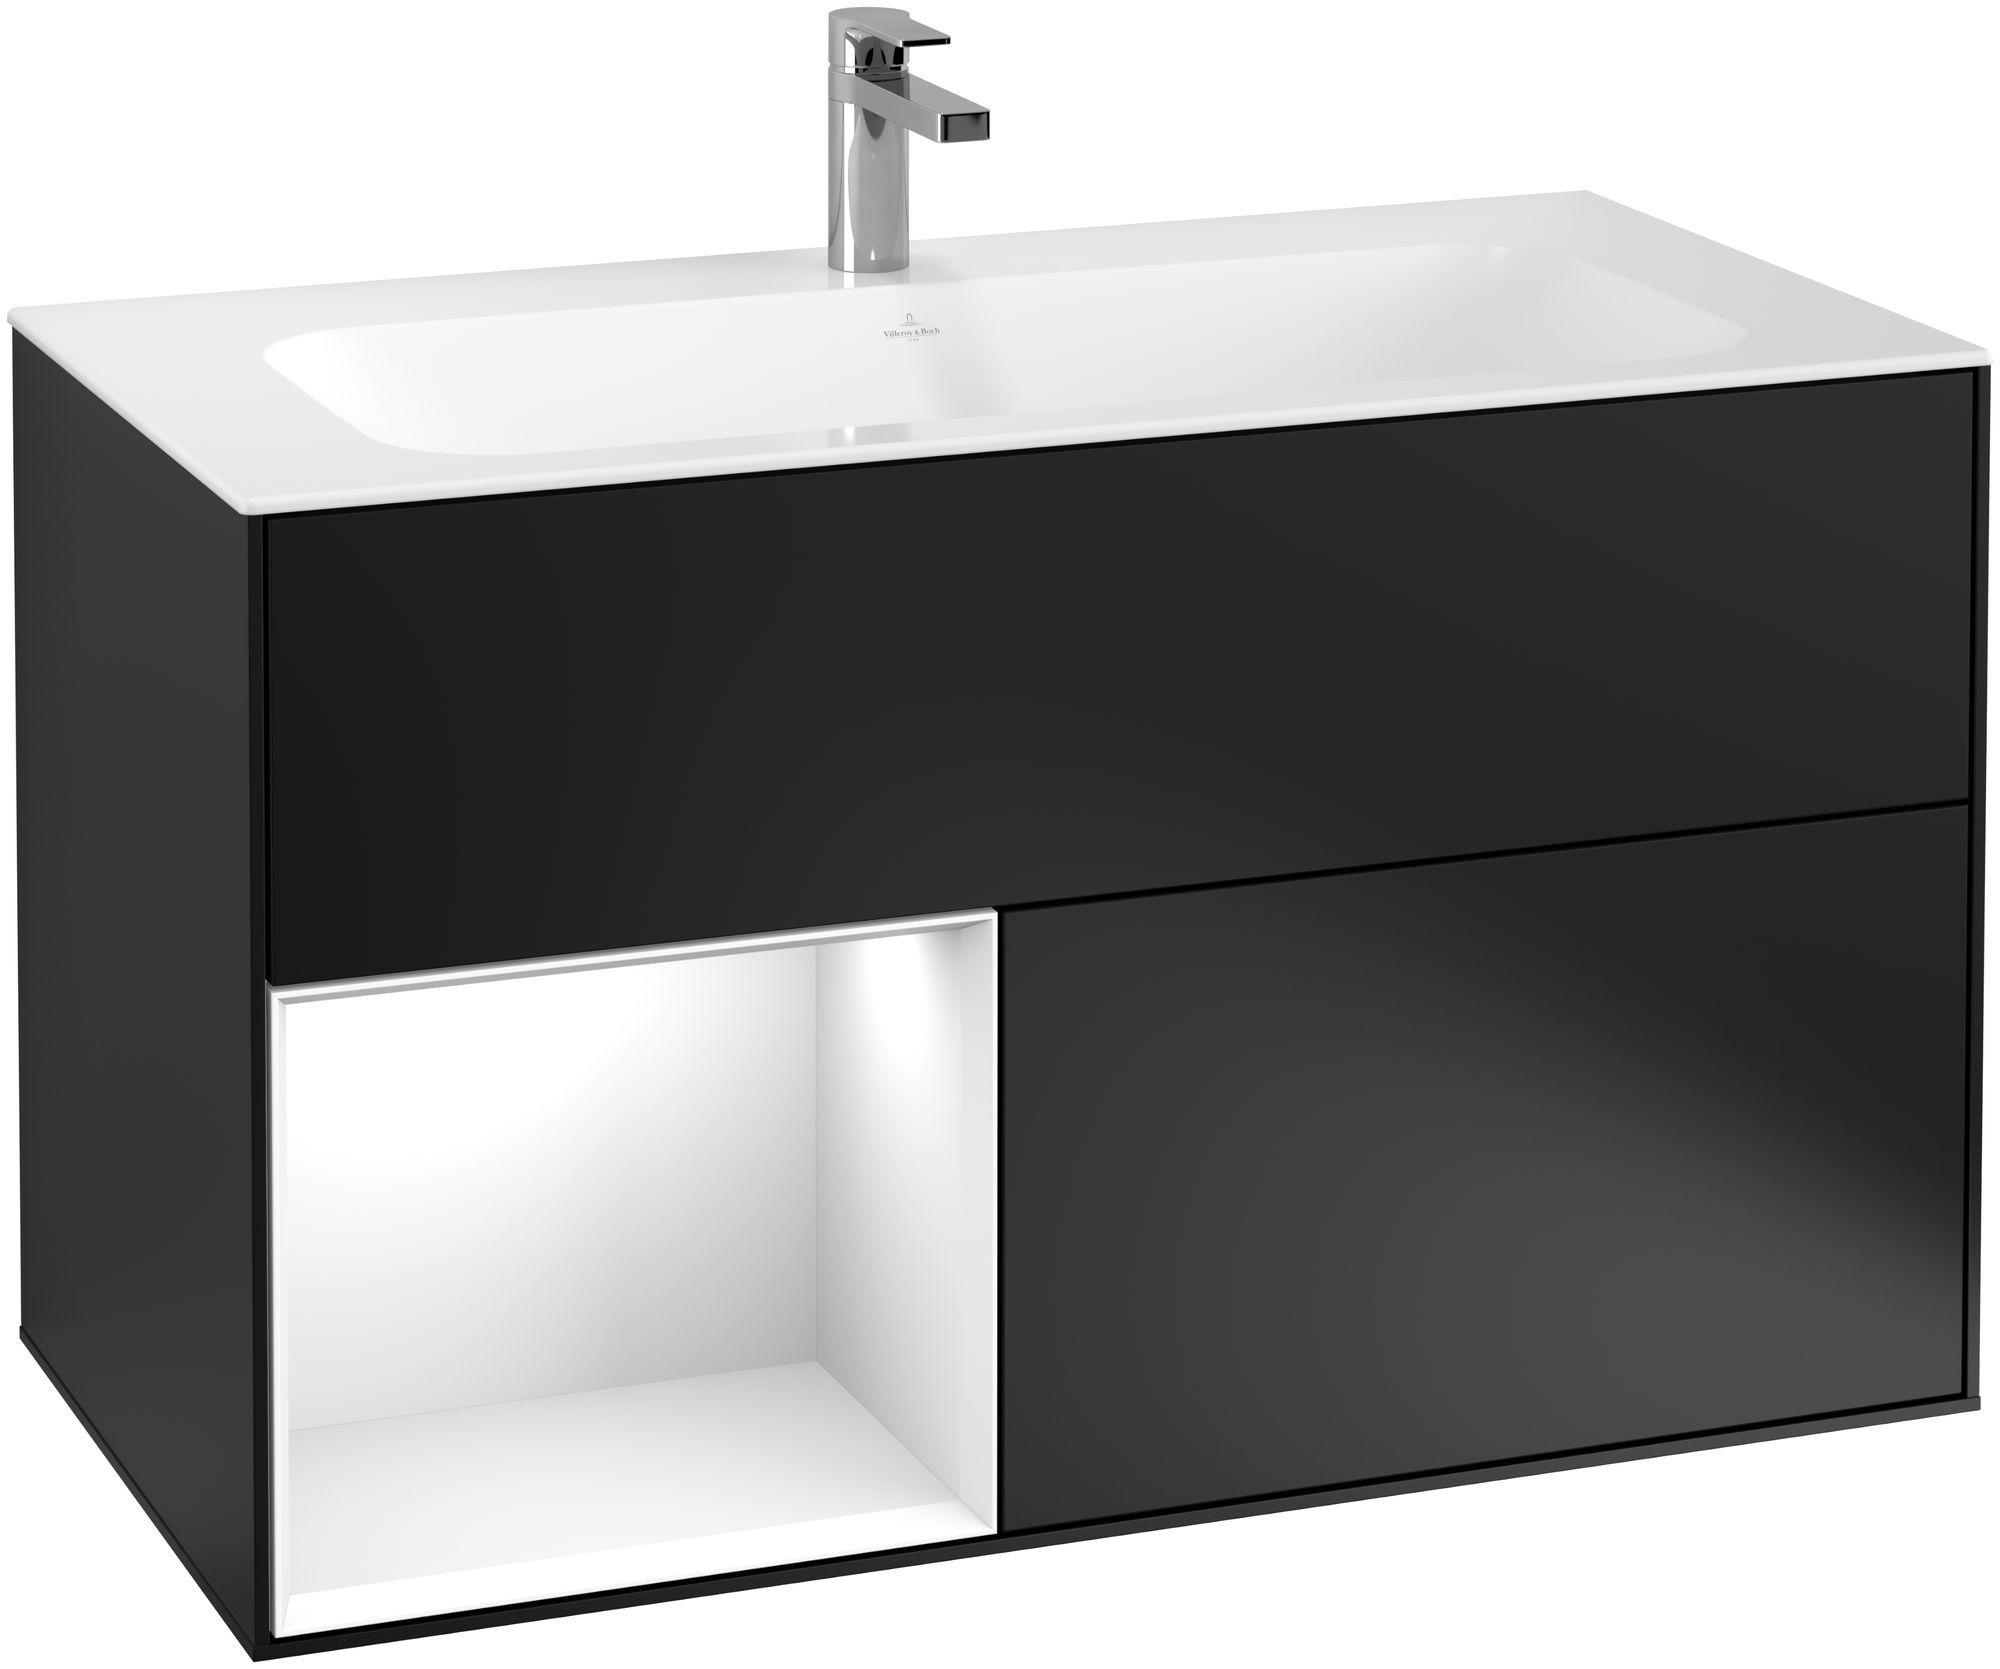 Villeroy & Boch Finion F03 Waschtischunterschrank mit Regalelement 2 Auszüge LED-Beleuchtung B:99,6xH:59,1xT:49,8cm Front, Korpus: Black Matt Lacquer, Regal: Glossy White Lack F030GFPD